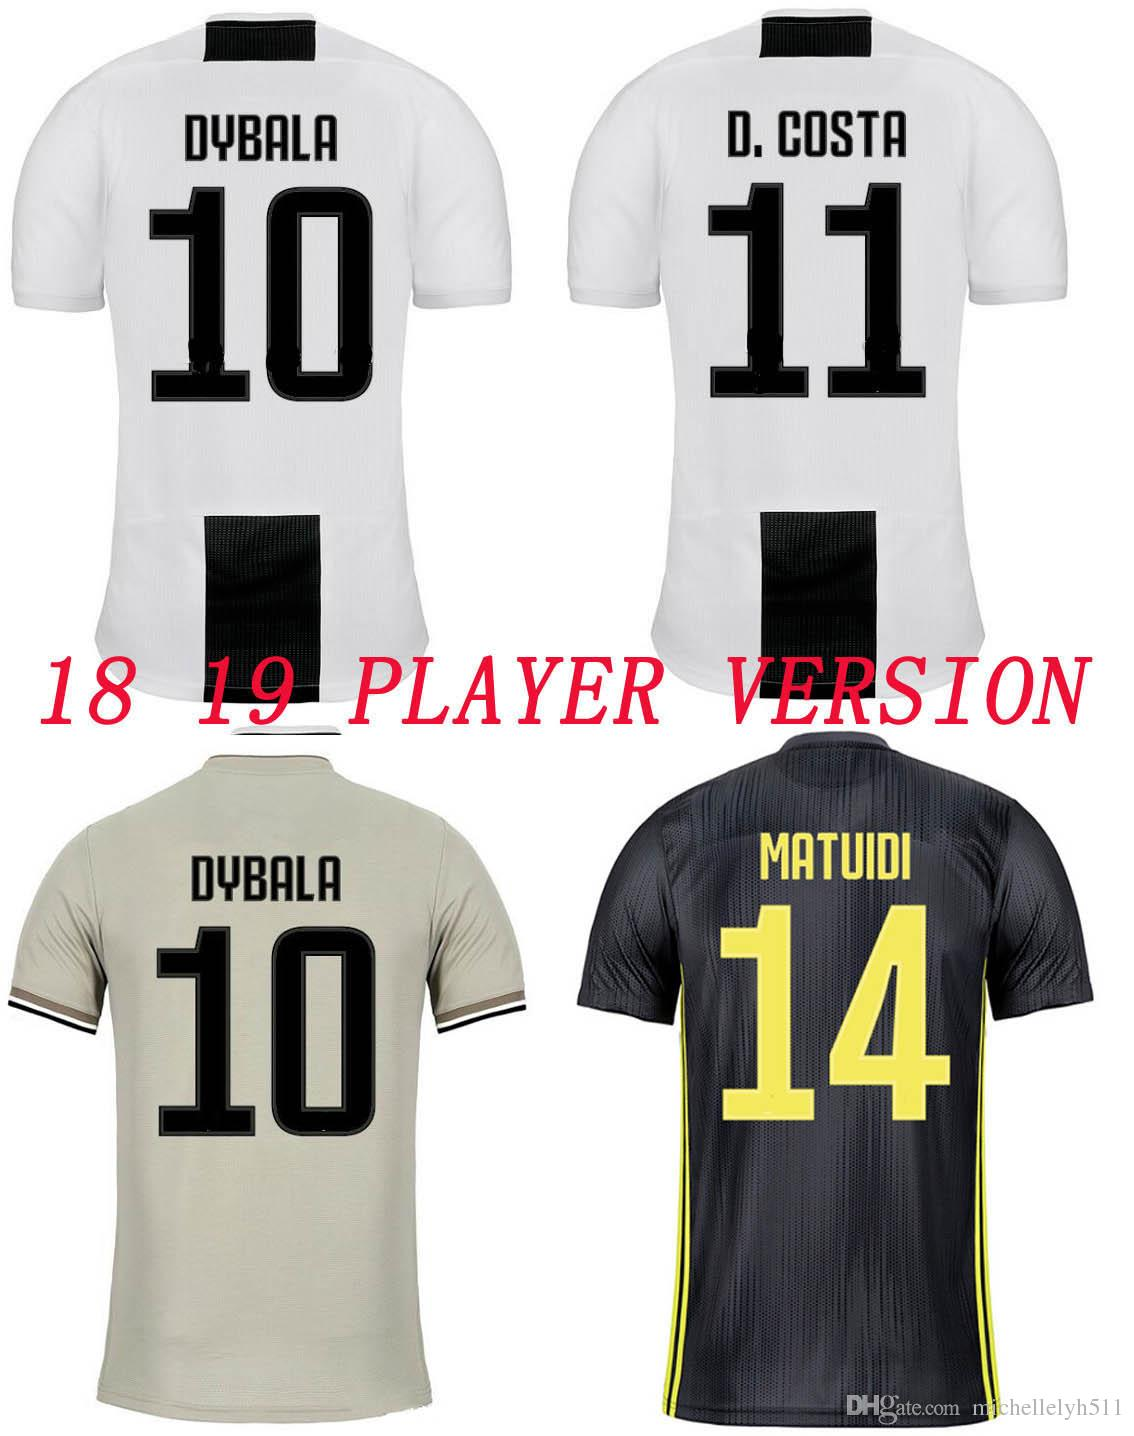 0f209fecc02 2018 2019 Juventusing Player Version Soccer Jersey 18 19 DYBALA D. COSTA  RONALDO MANDZUKIC Footall Jersey Adult Playver Edition Soocer Shirt Juv  Player ...